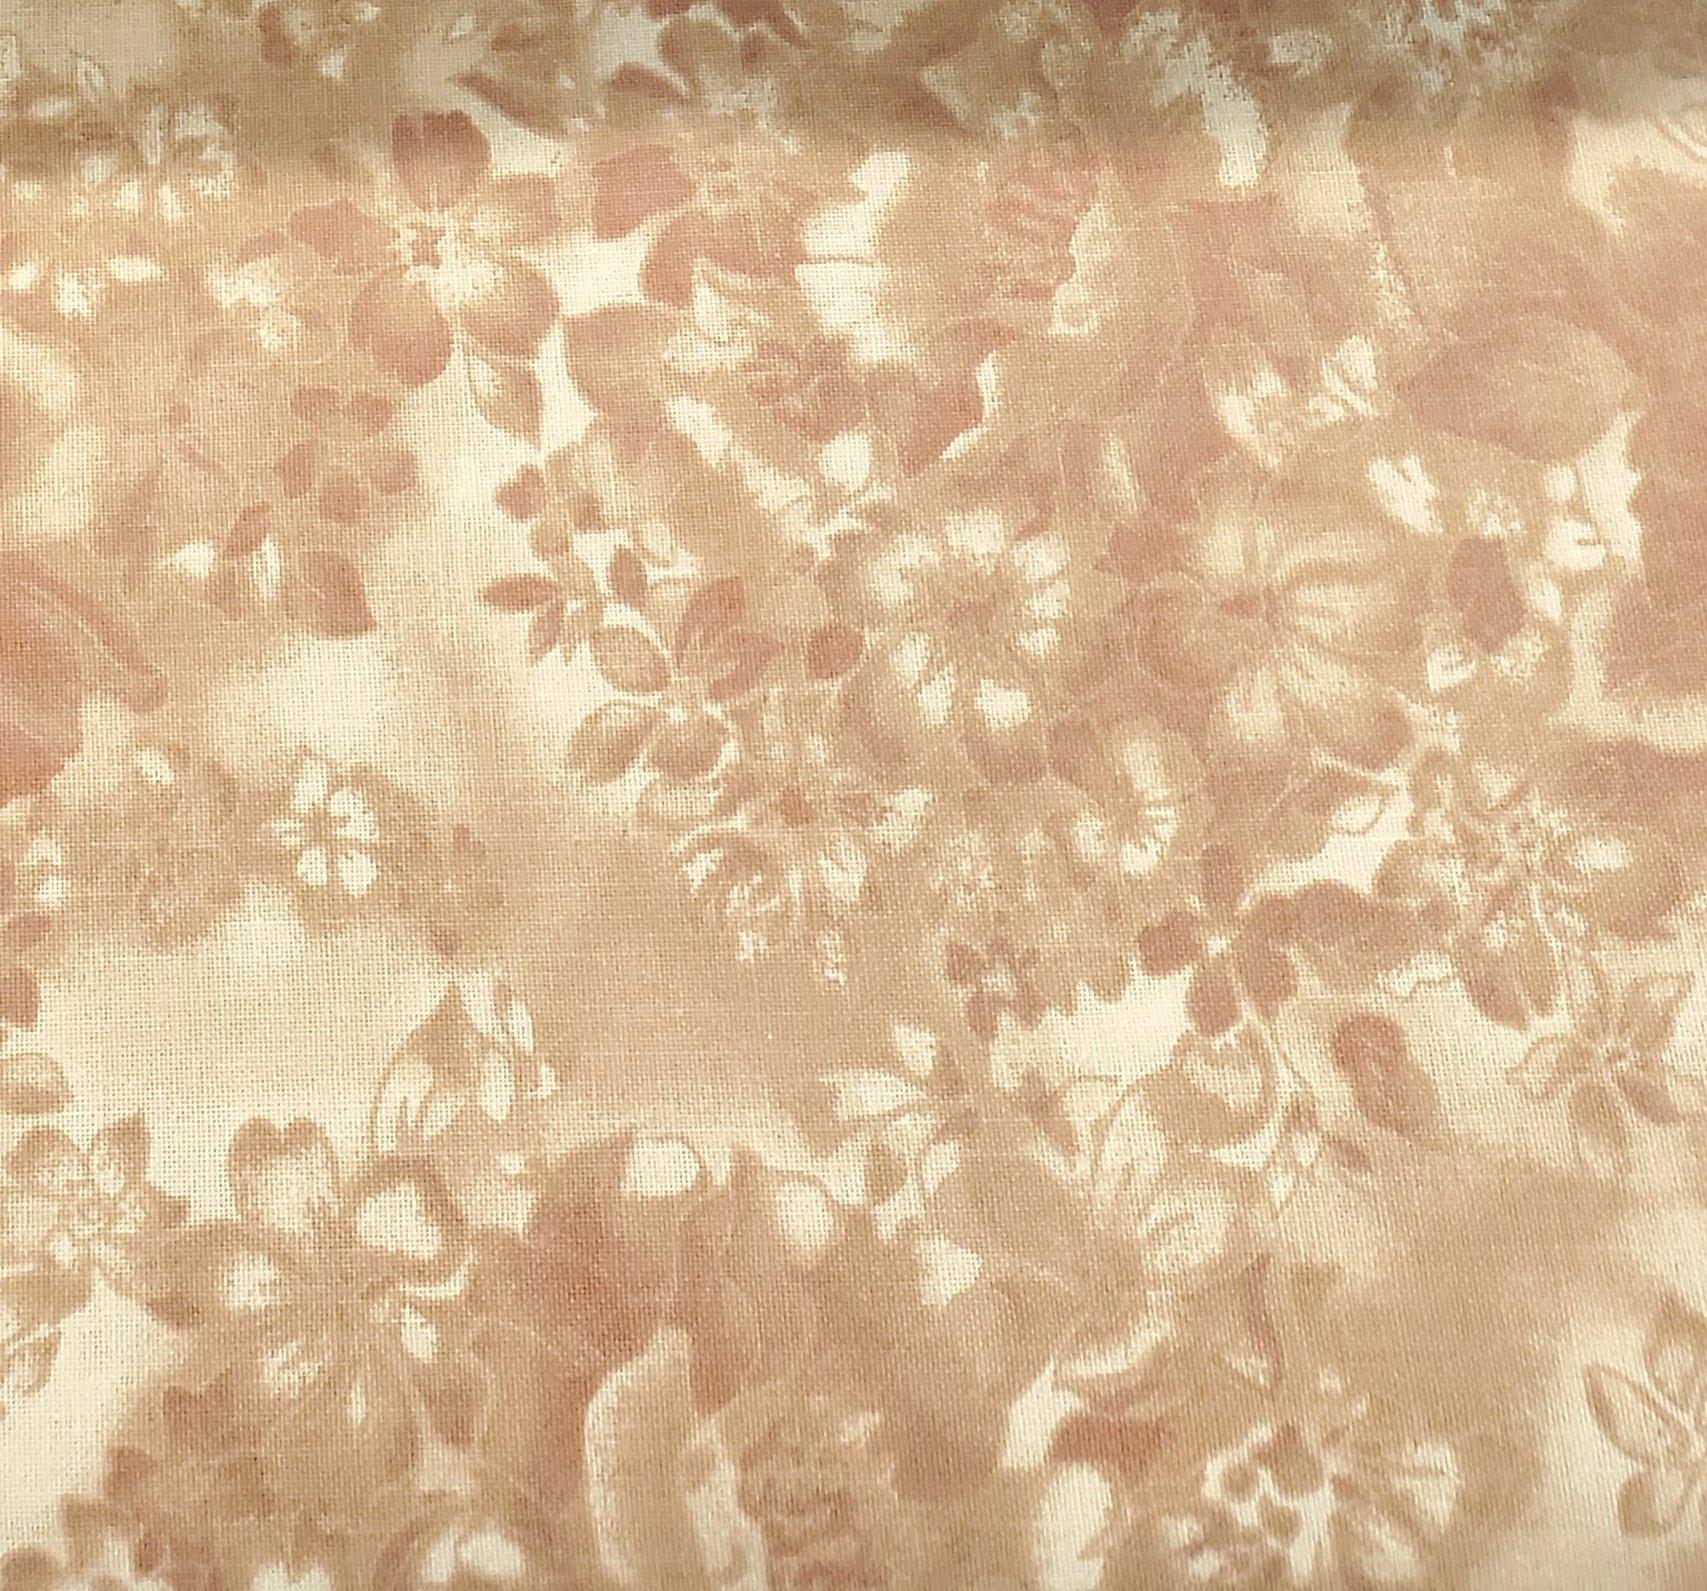 3 Yard Backing Piece: 108 Wide Rosy Camel Faded Flowers in a single 3 yard piece